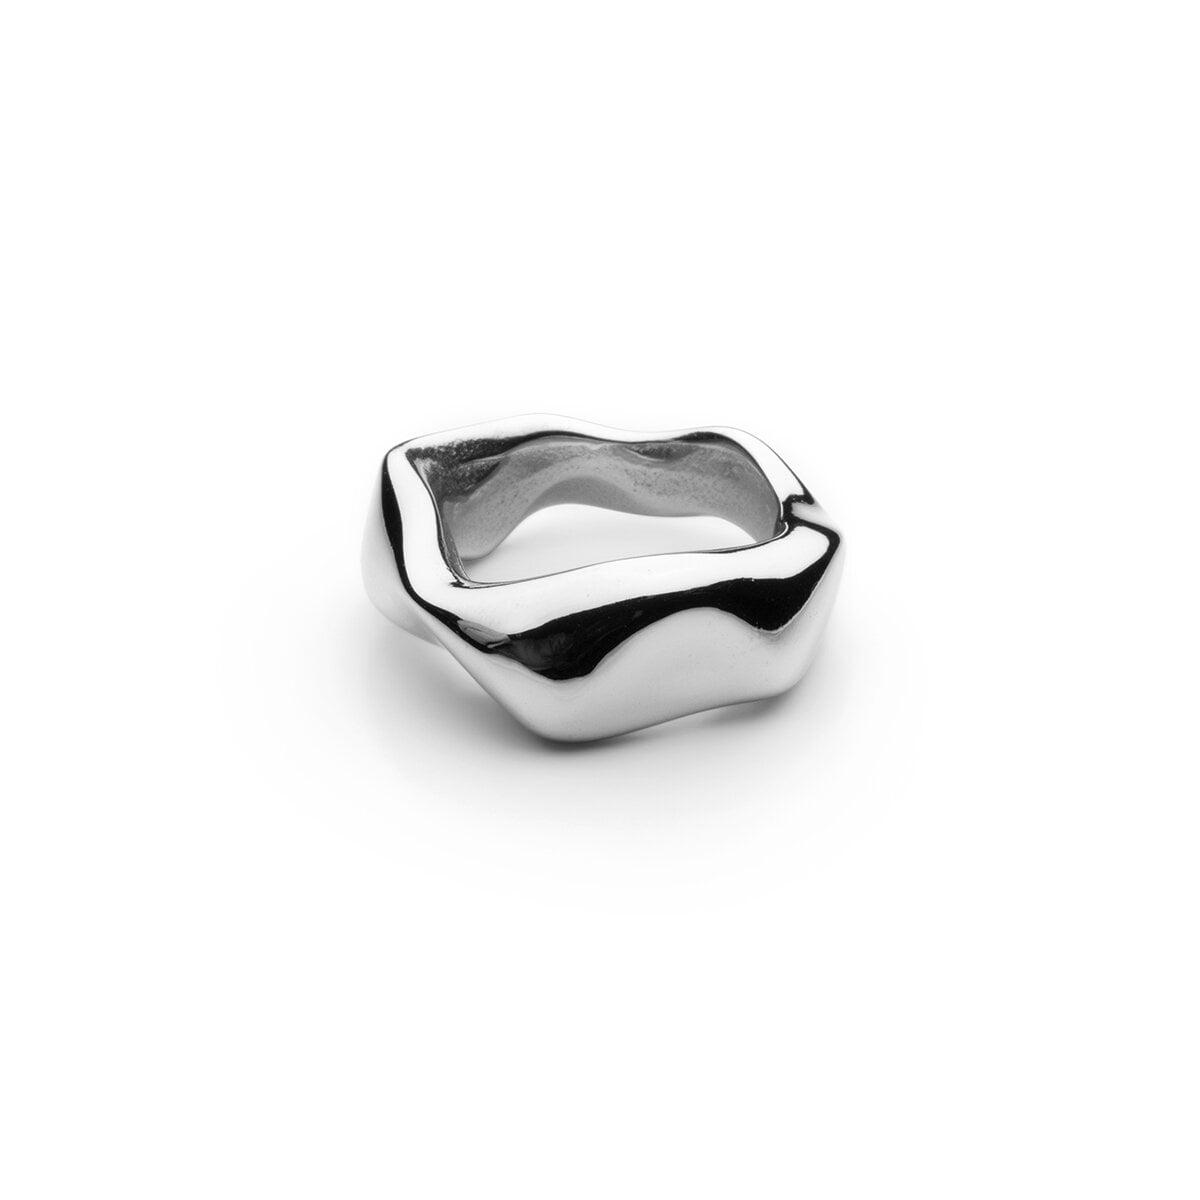 Chunky Petit Ring - Polished Steel